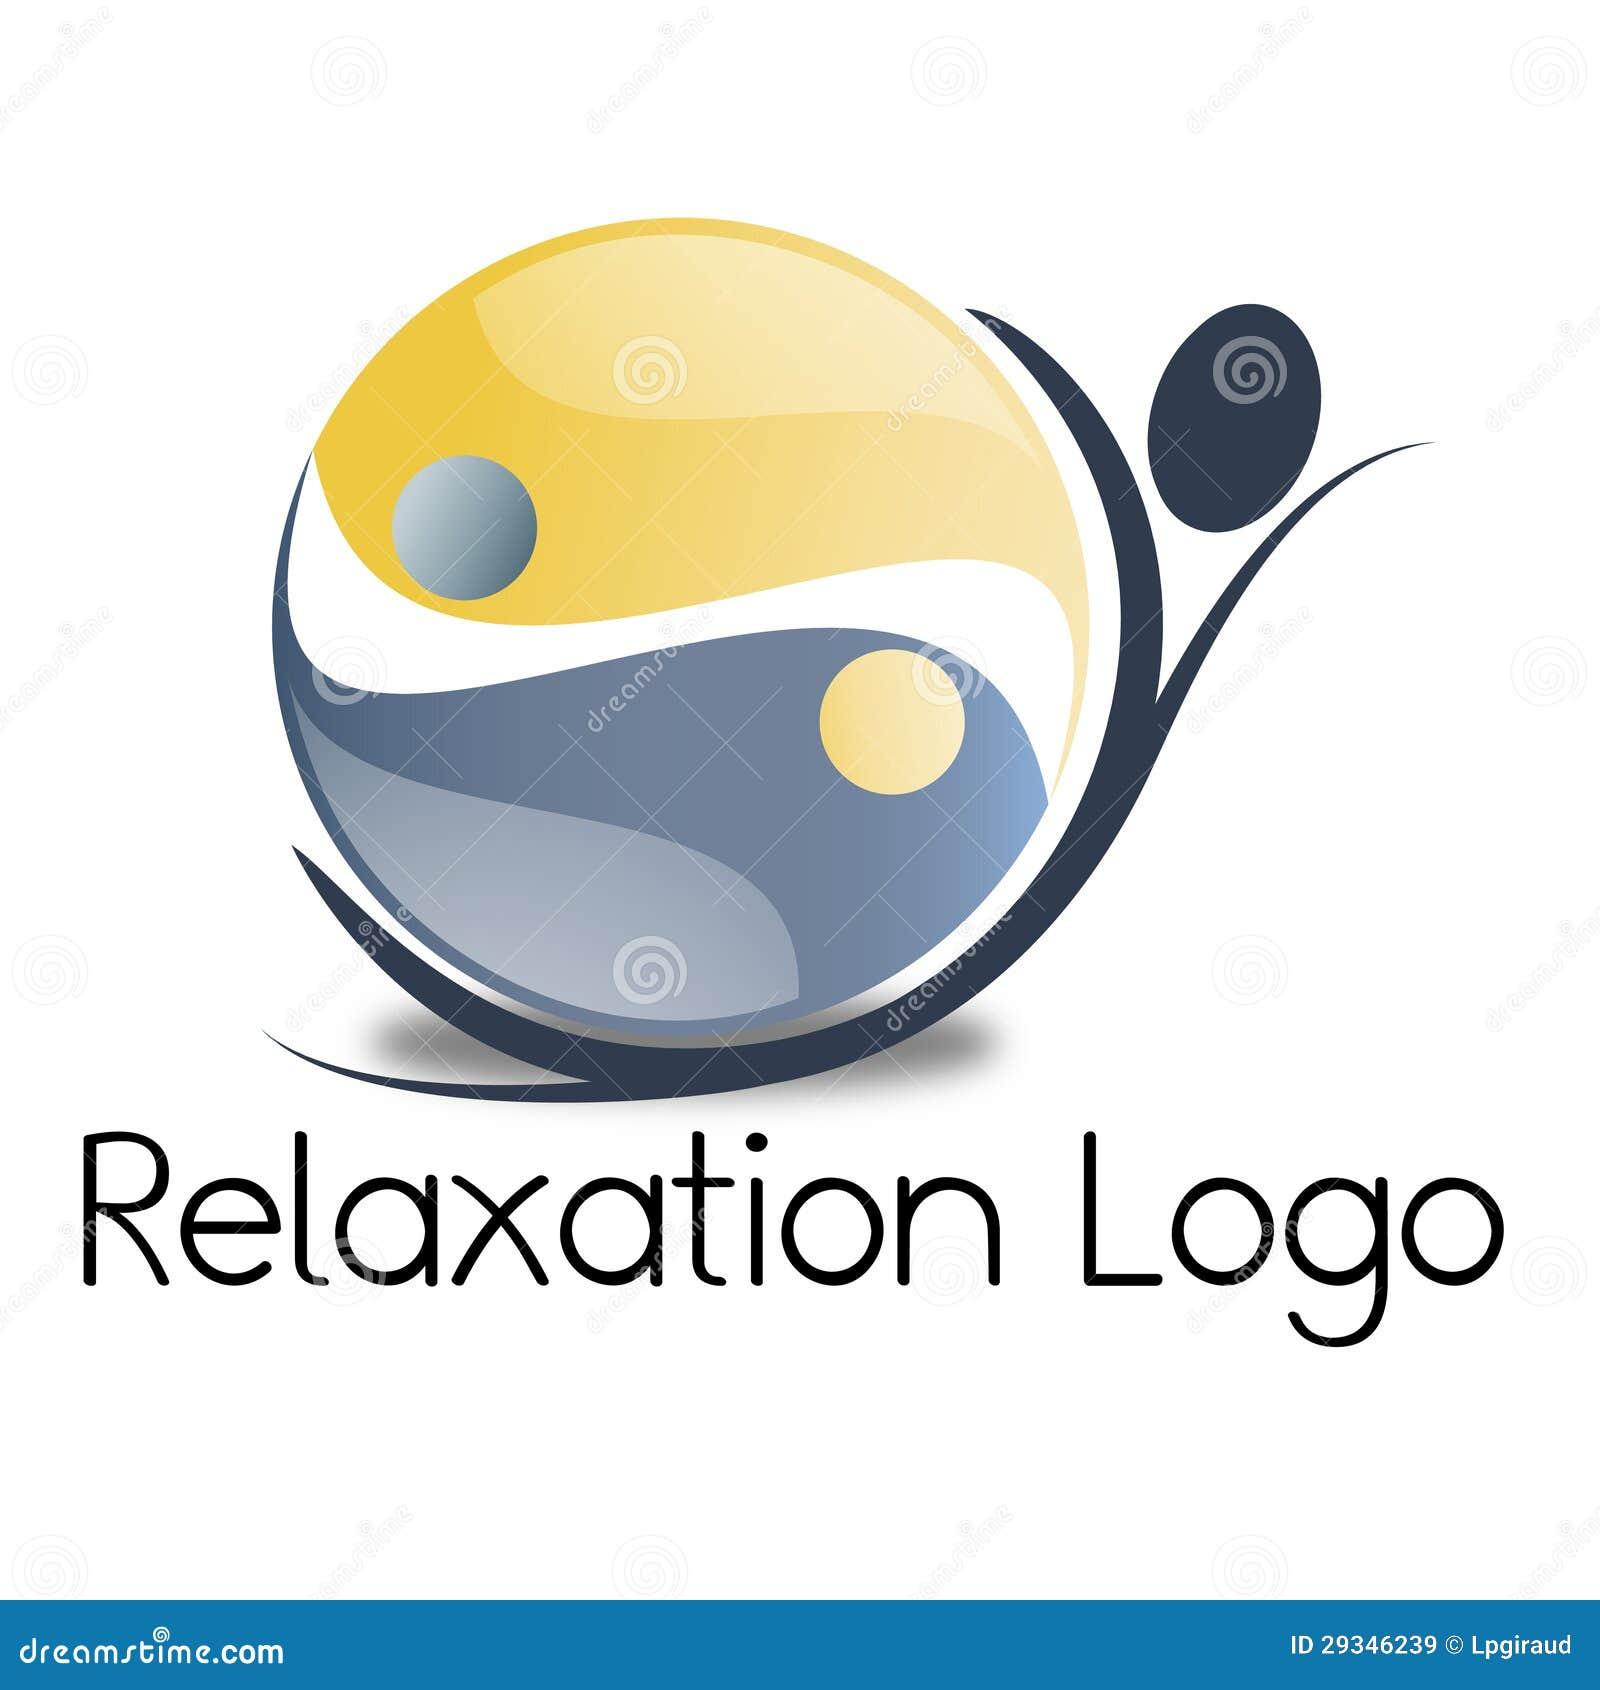 Relaxation Logo Royalty Free Stock Images - Image: 29346239